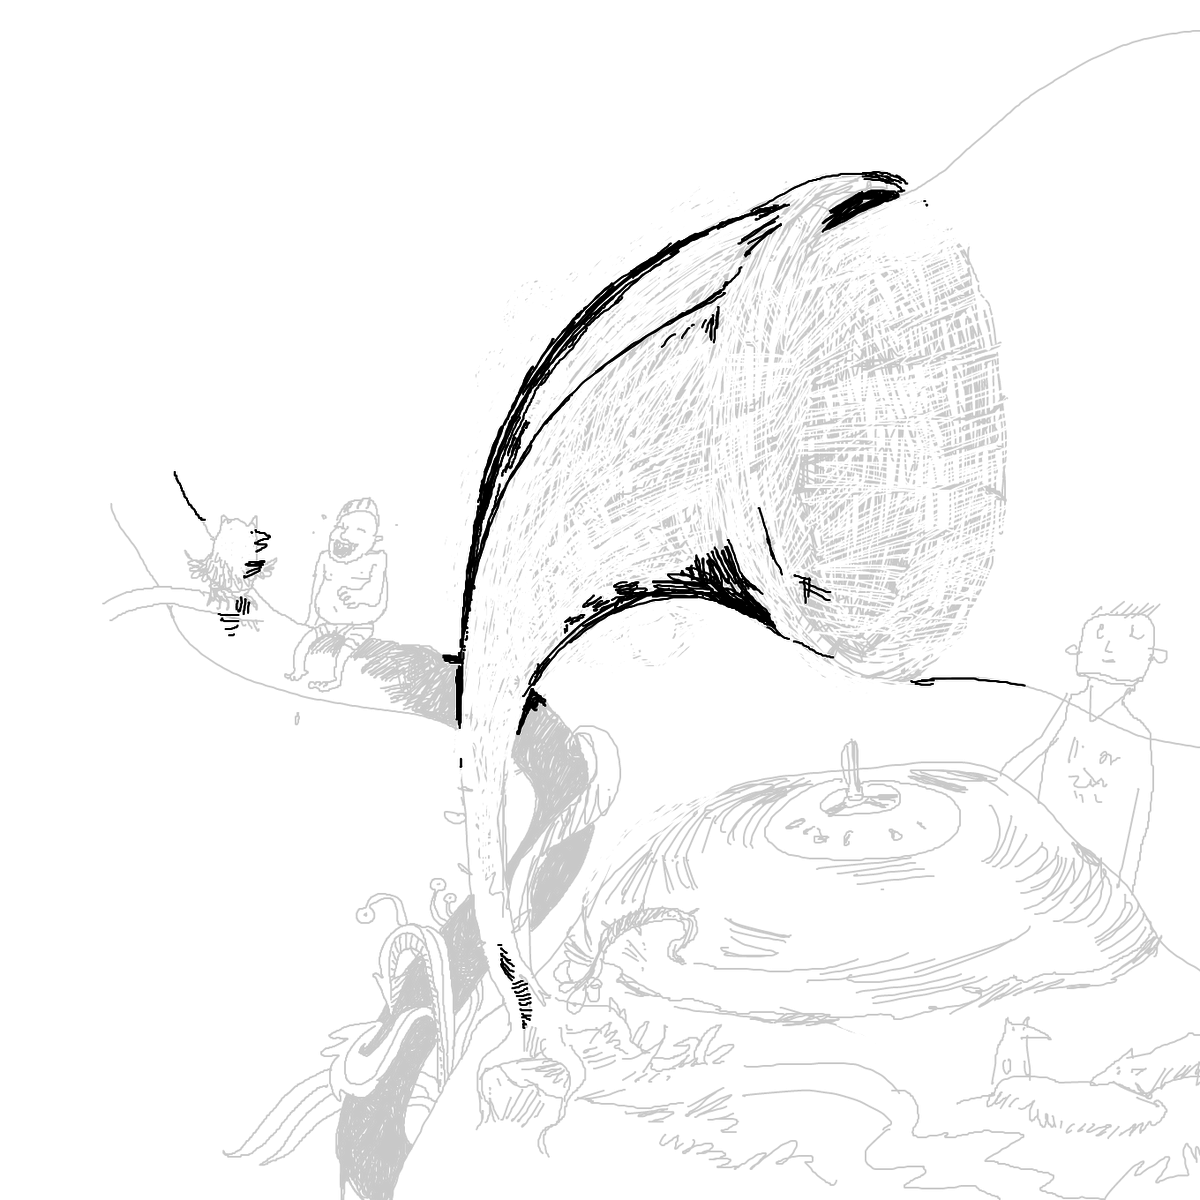 BAAAM drawing#4144 lat:78.4207687377929700lng: -4.4888358116149900